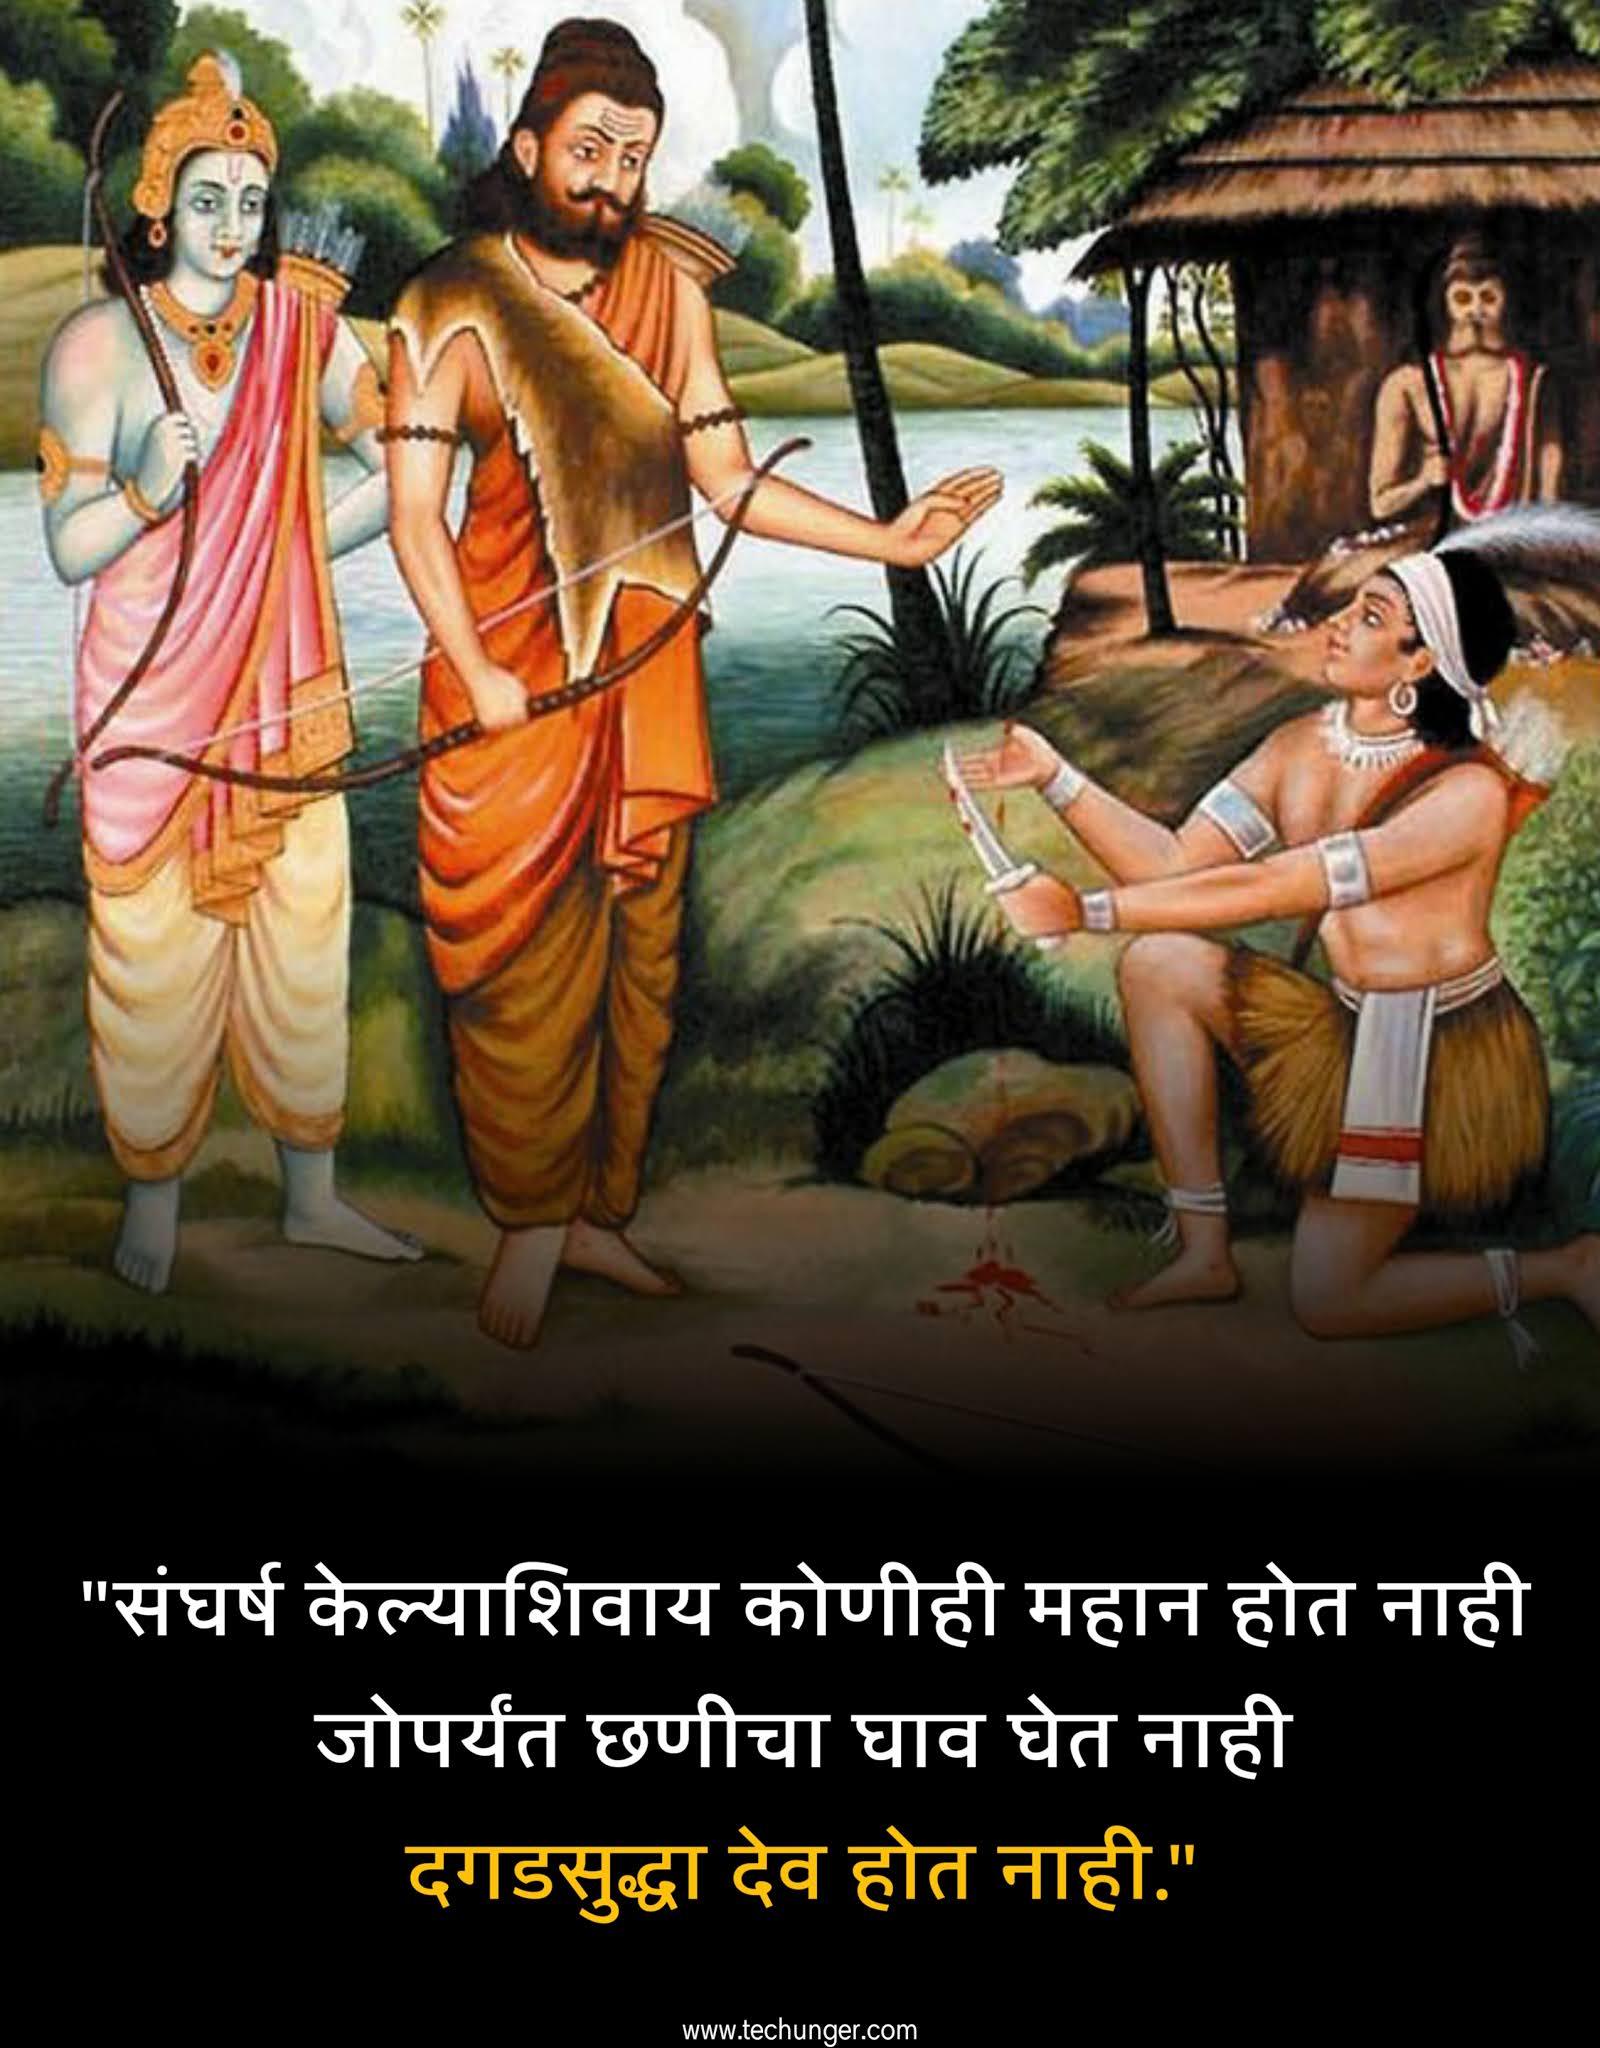 eklavya, techunger, dronacharaya, arjun, arrows, guru purnima